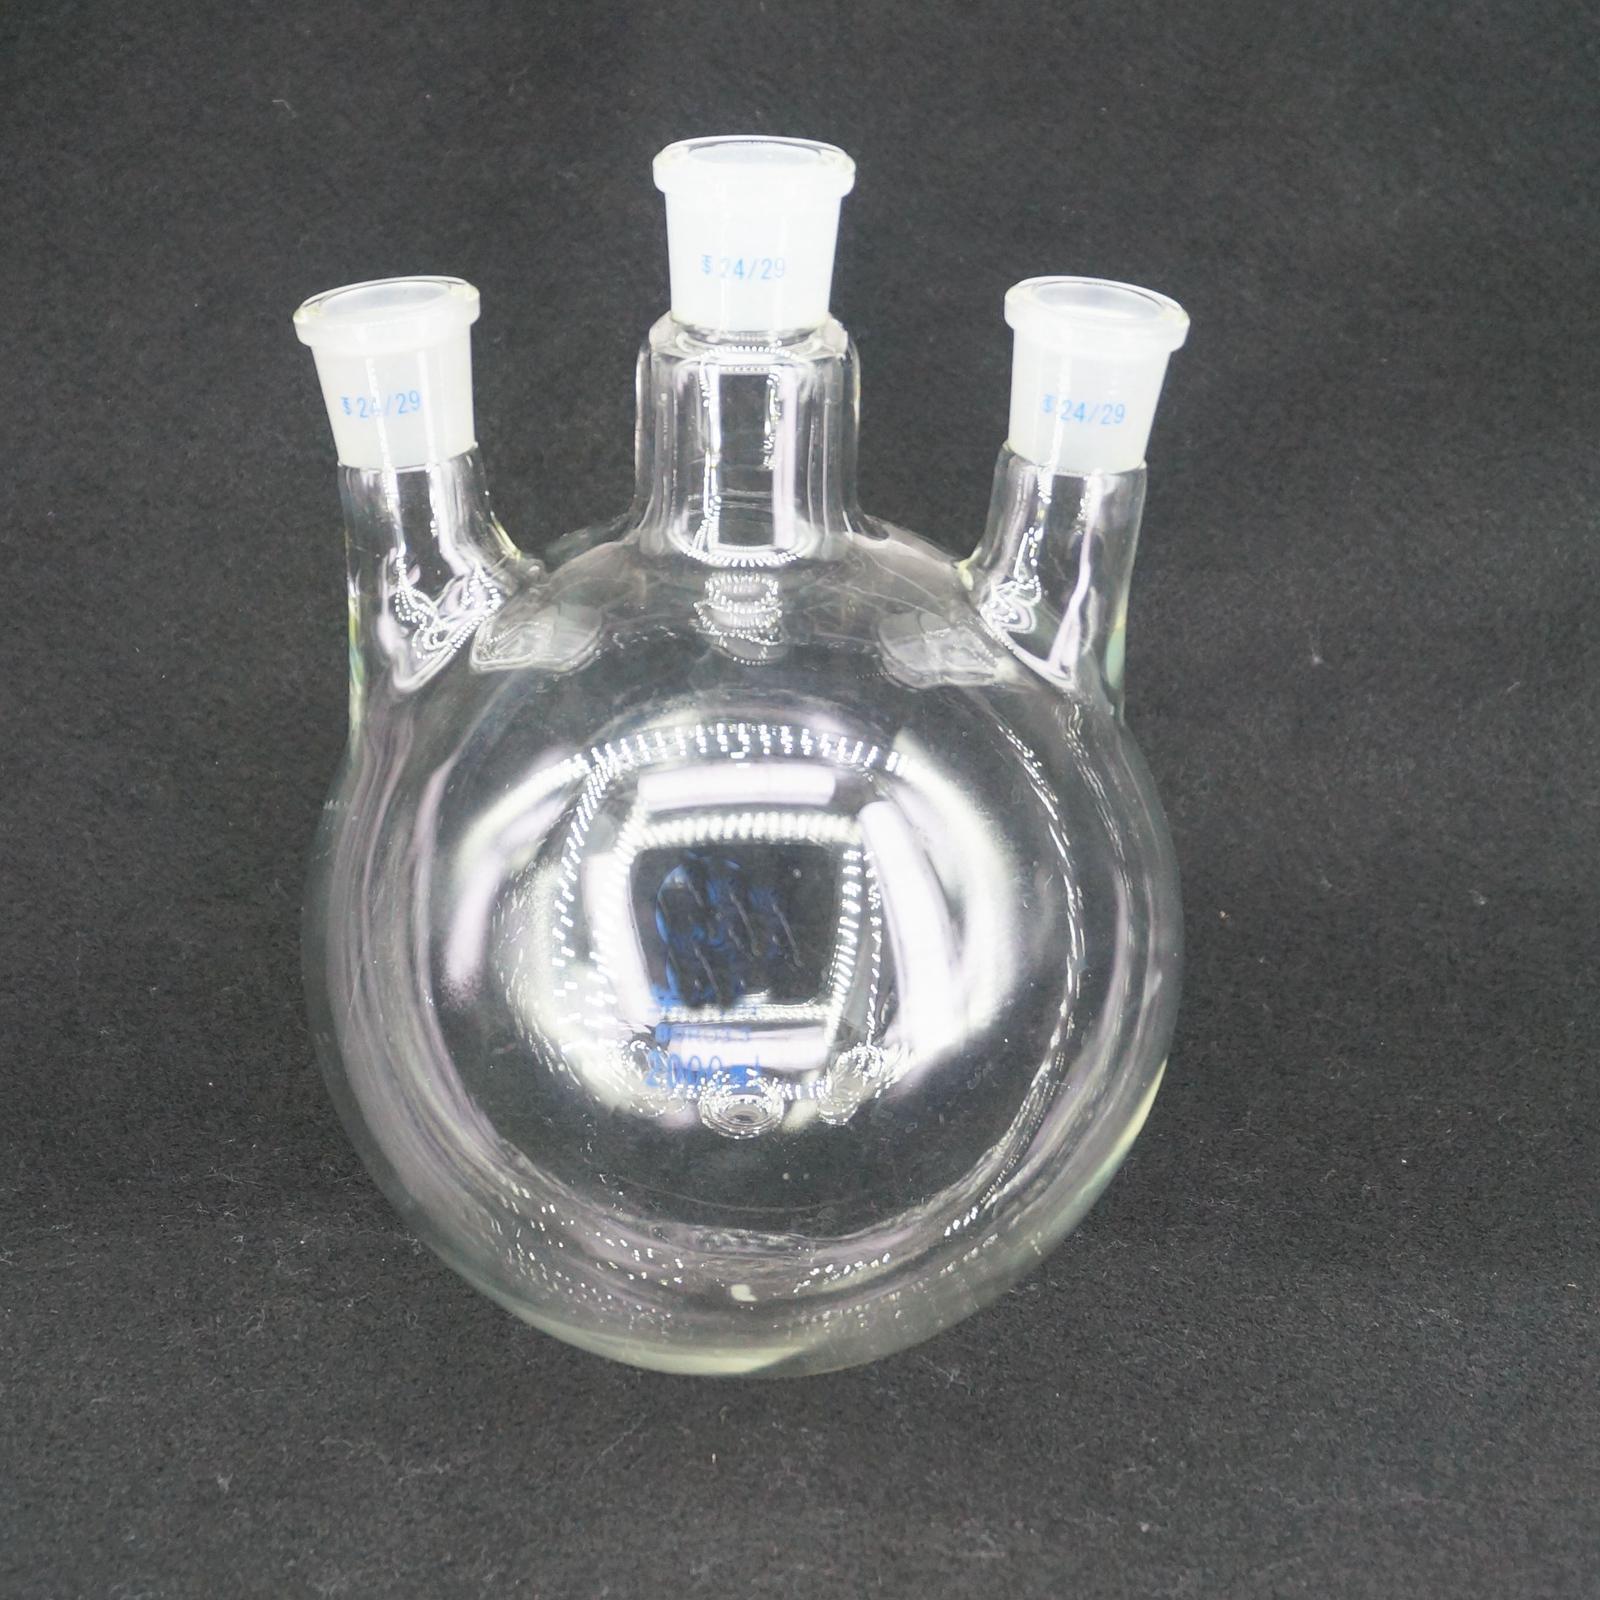 2000ml Laboratory Borosilicate Glass 24/29 Joint Glass Flask round bottom with Vertical 3-Neck цена